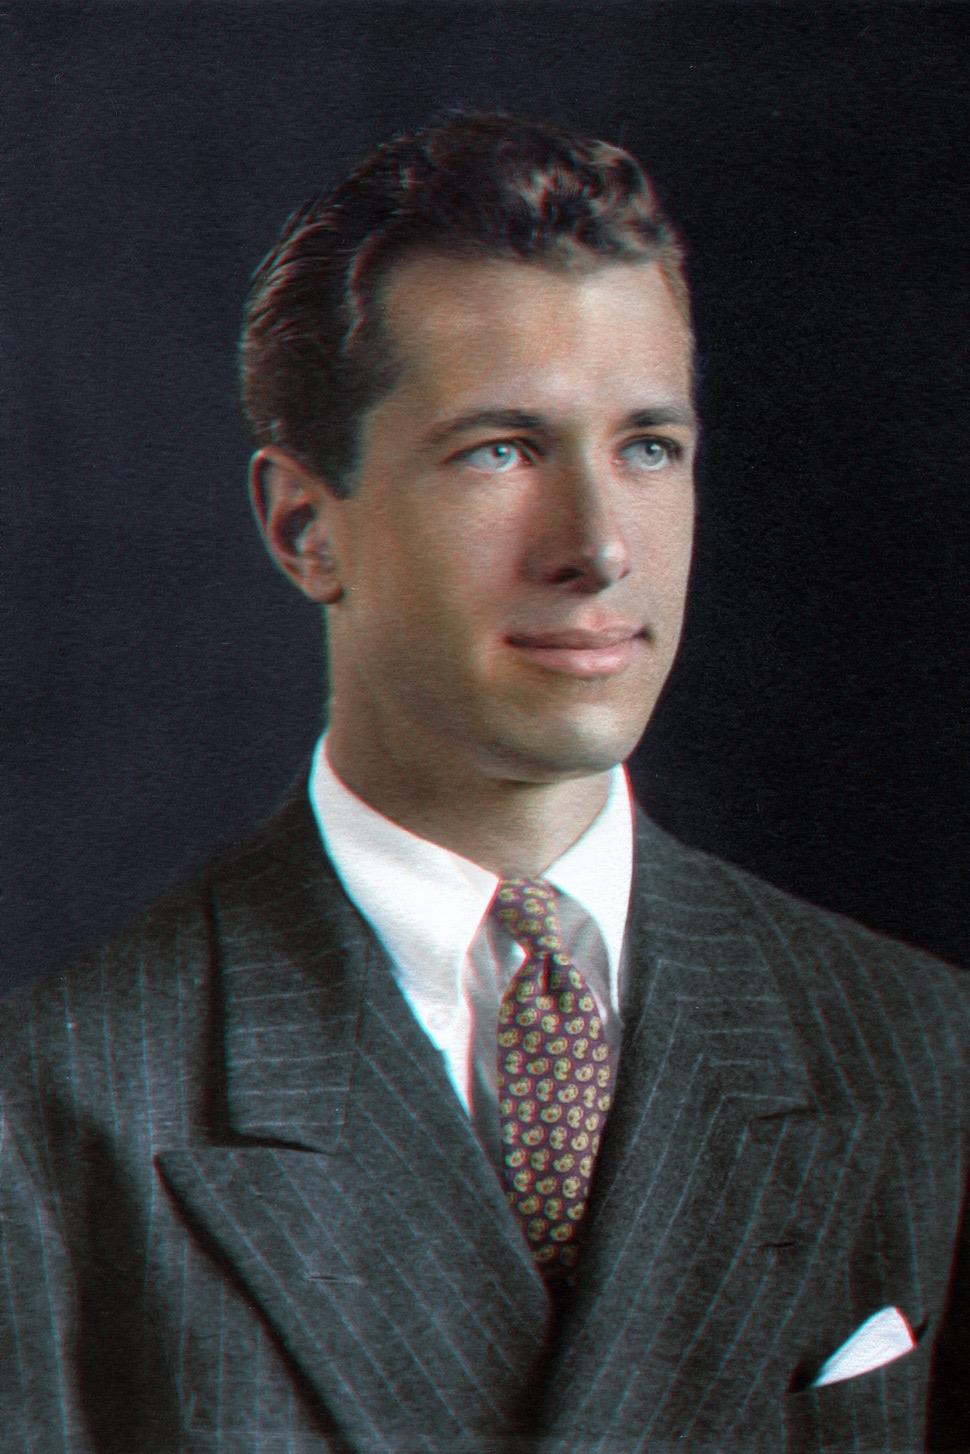 George Mergenthaler 1943 yearbook pi